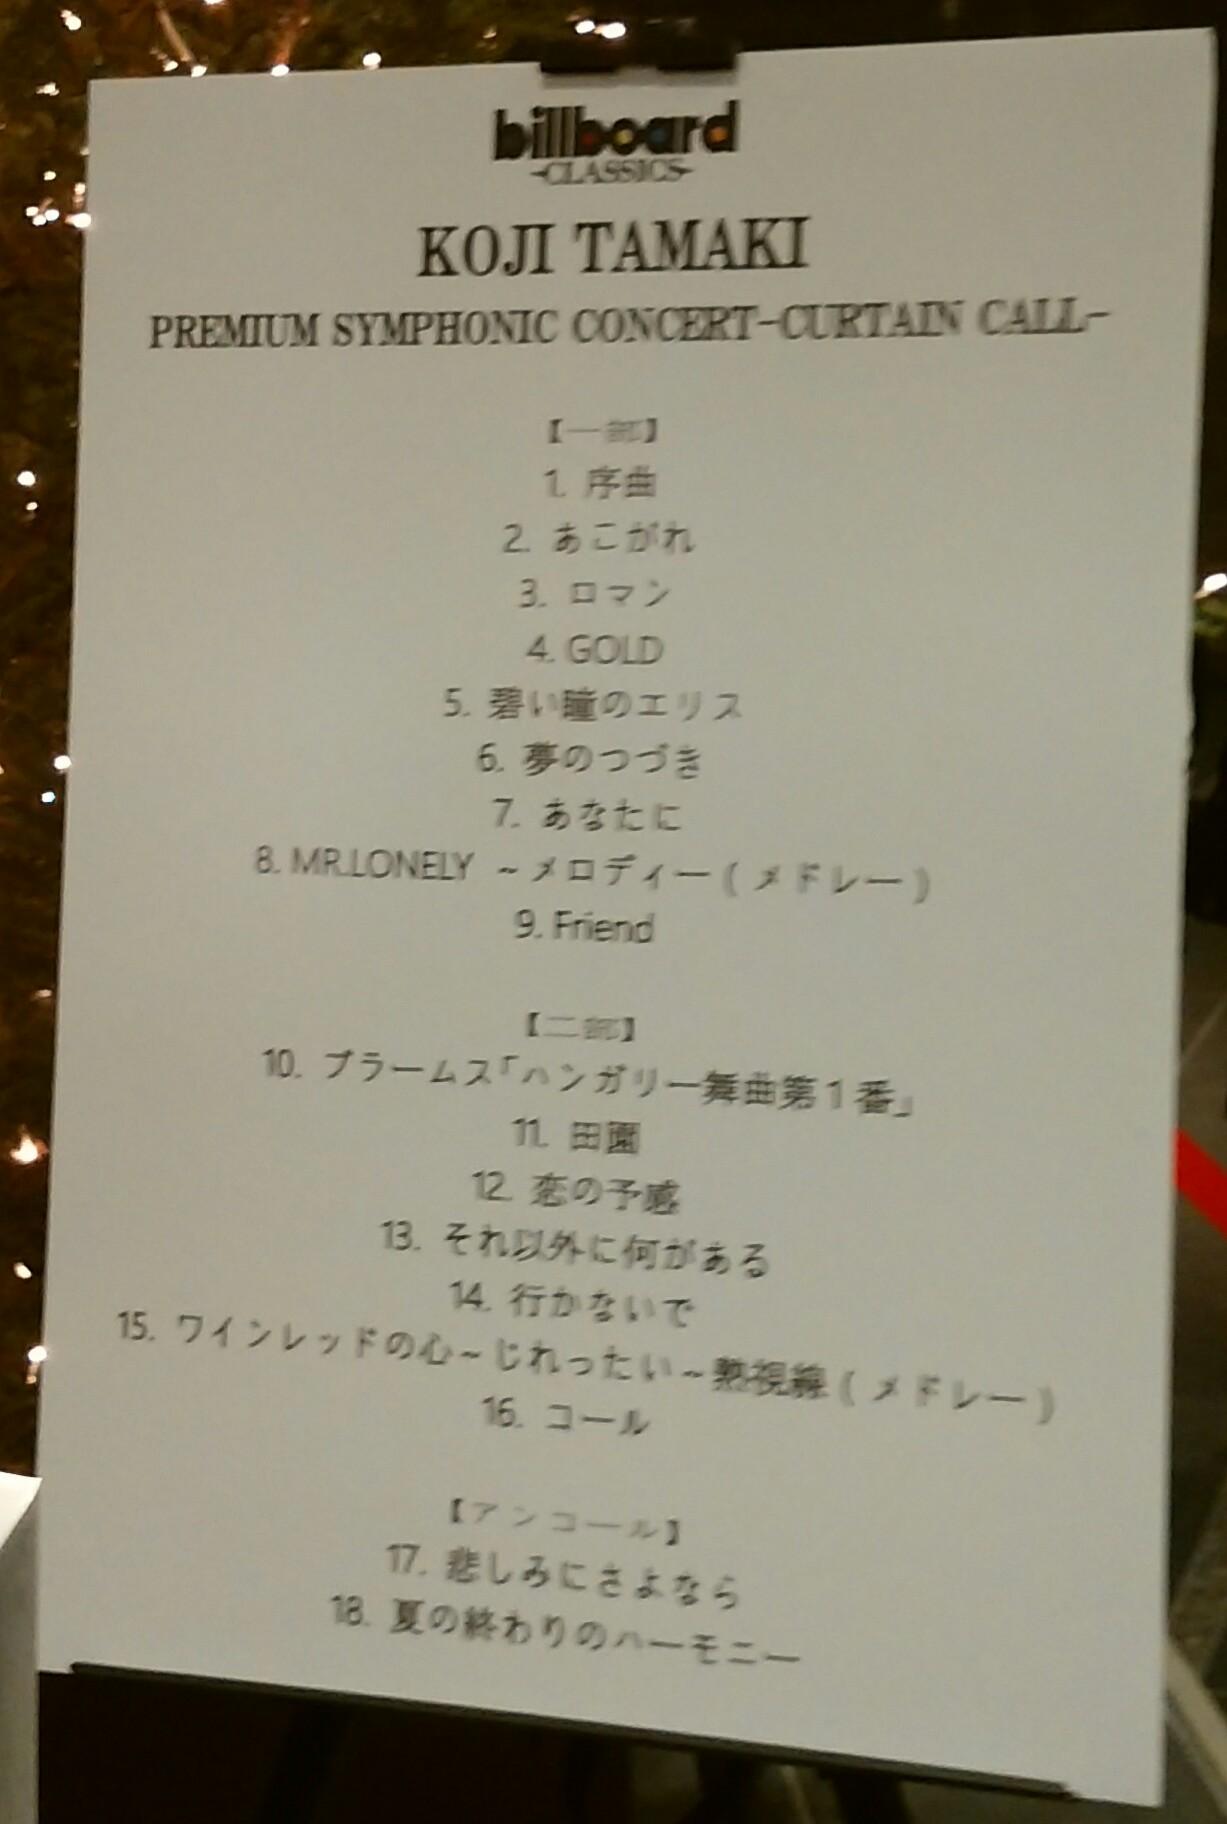 1/24「KOJI TAMAKI PREMIUM SIMPHONIC CONCERTーCURTAIN CALLーBRILLIANT NIGHTS FOR THE NEW WORLD」